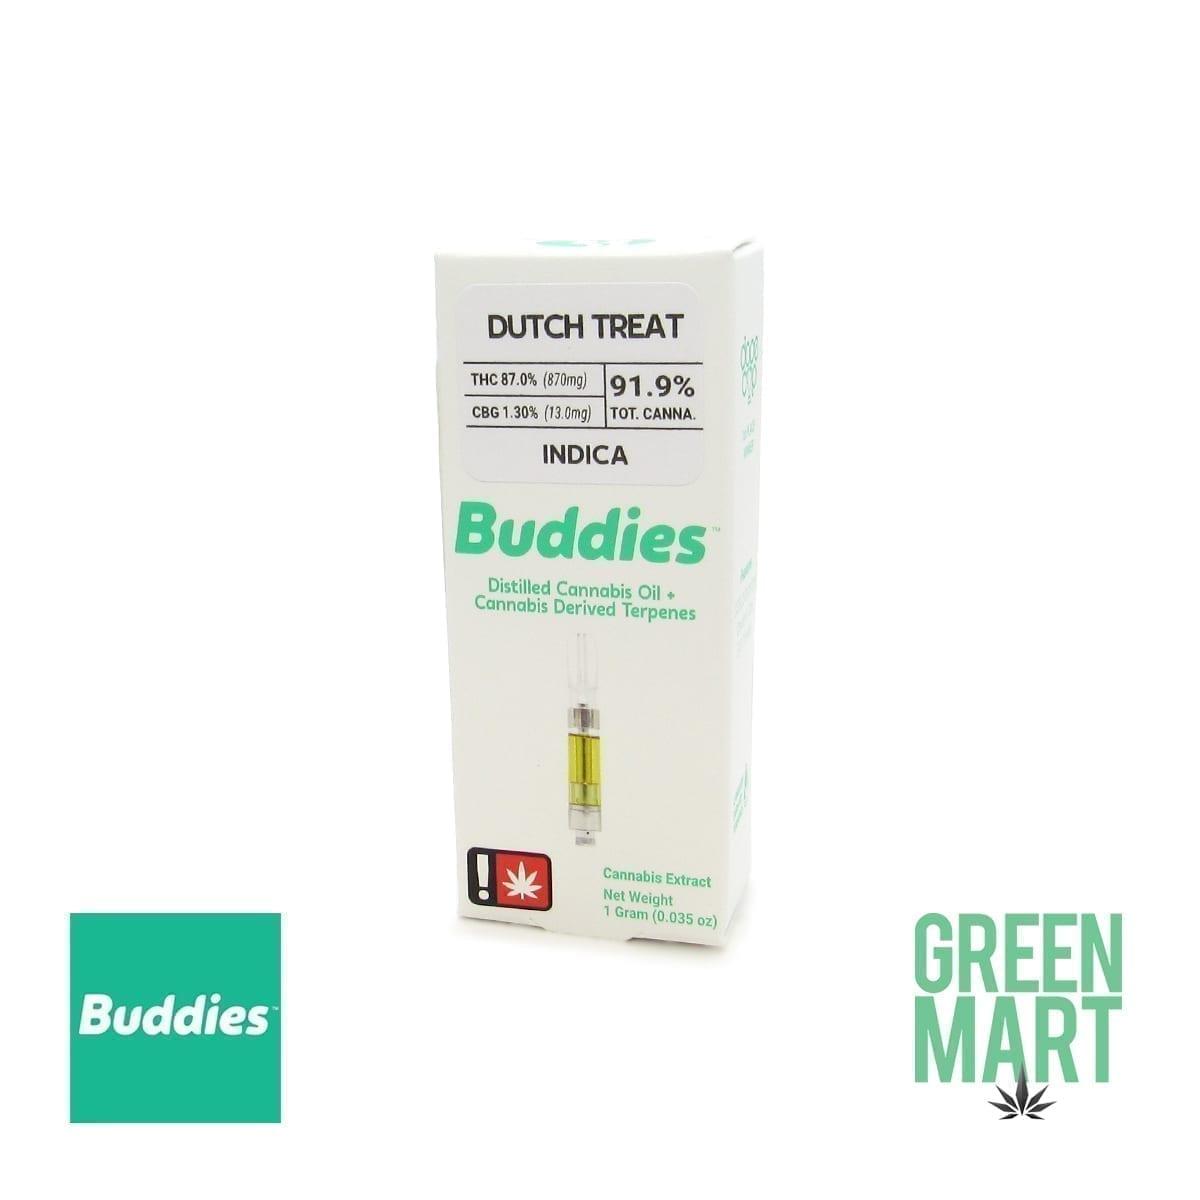 Buddies Brand Distillate Cartridge - Dutch Treat